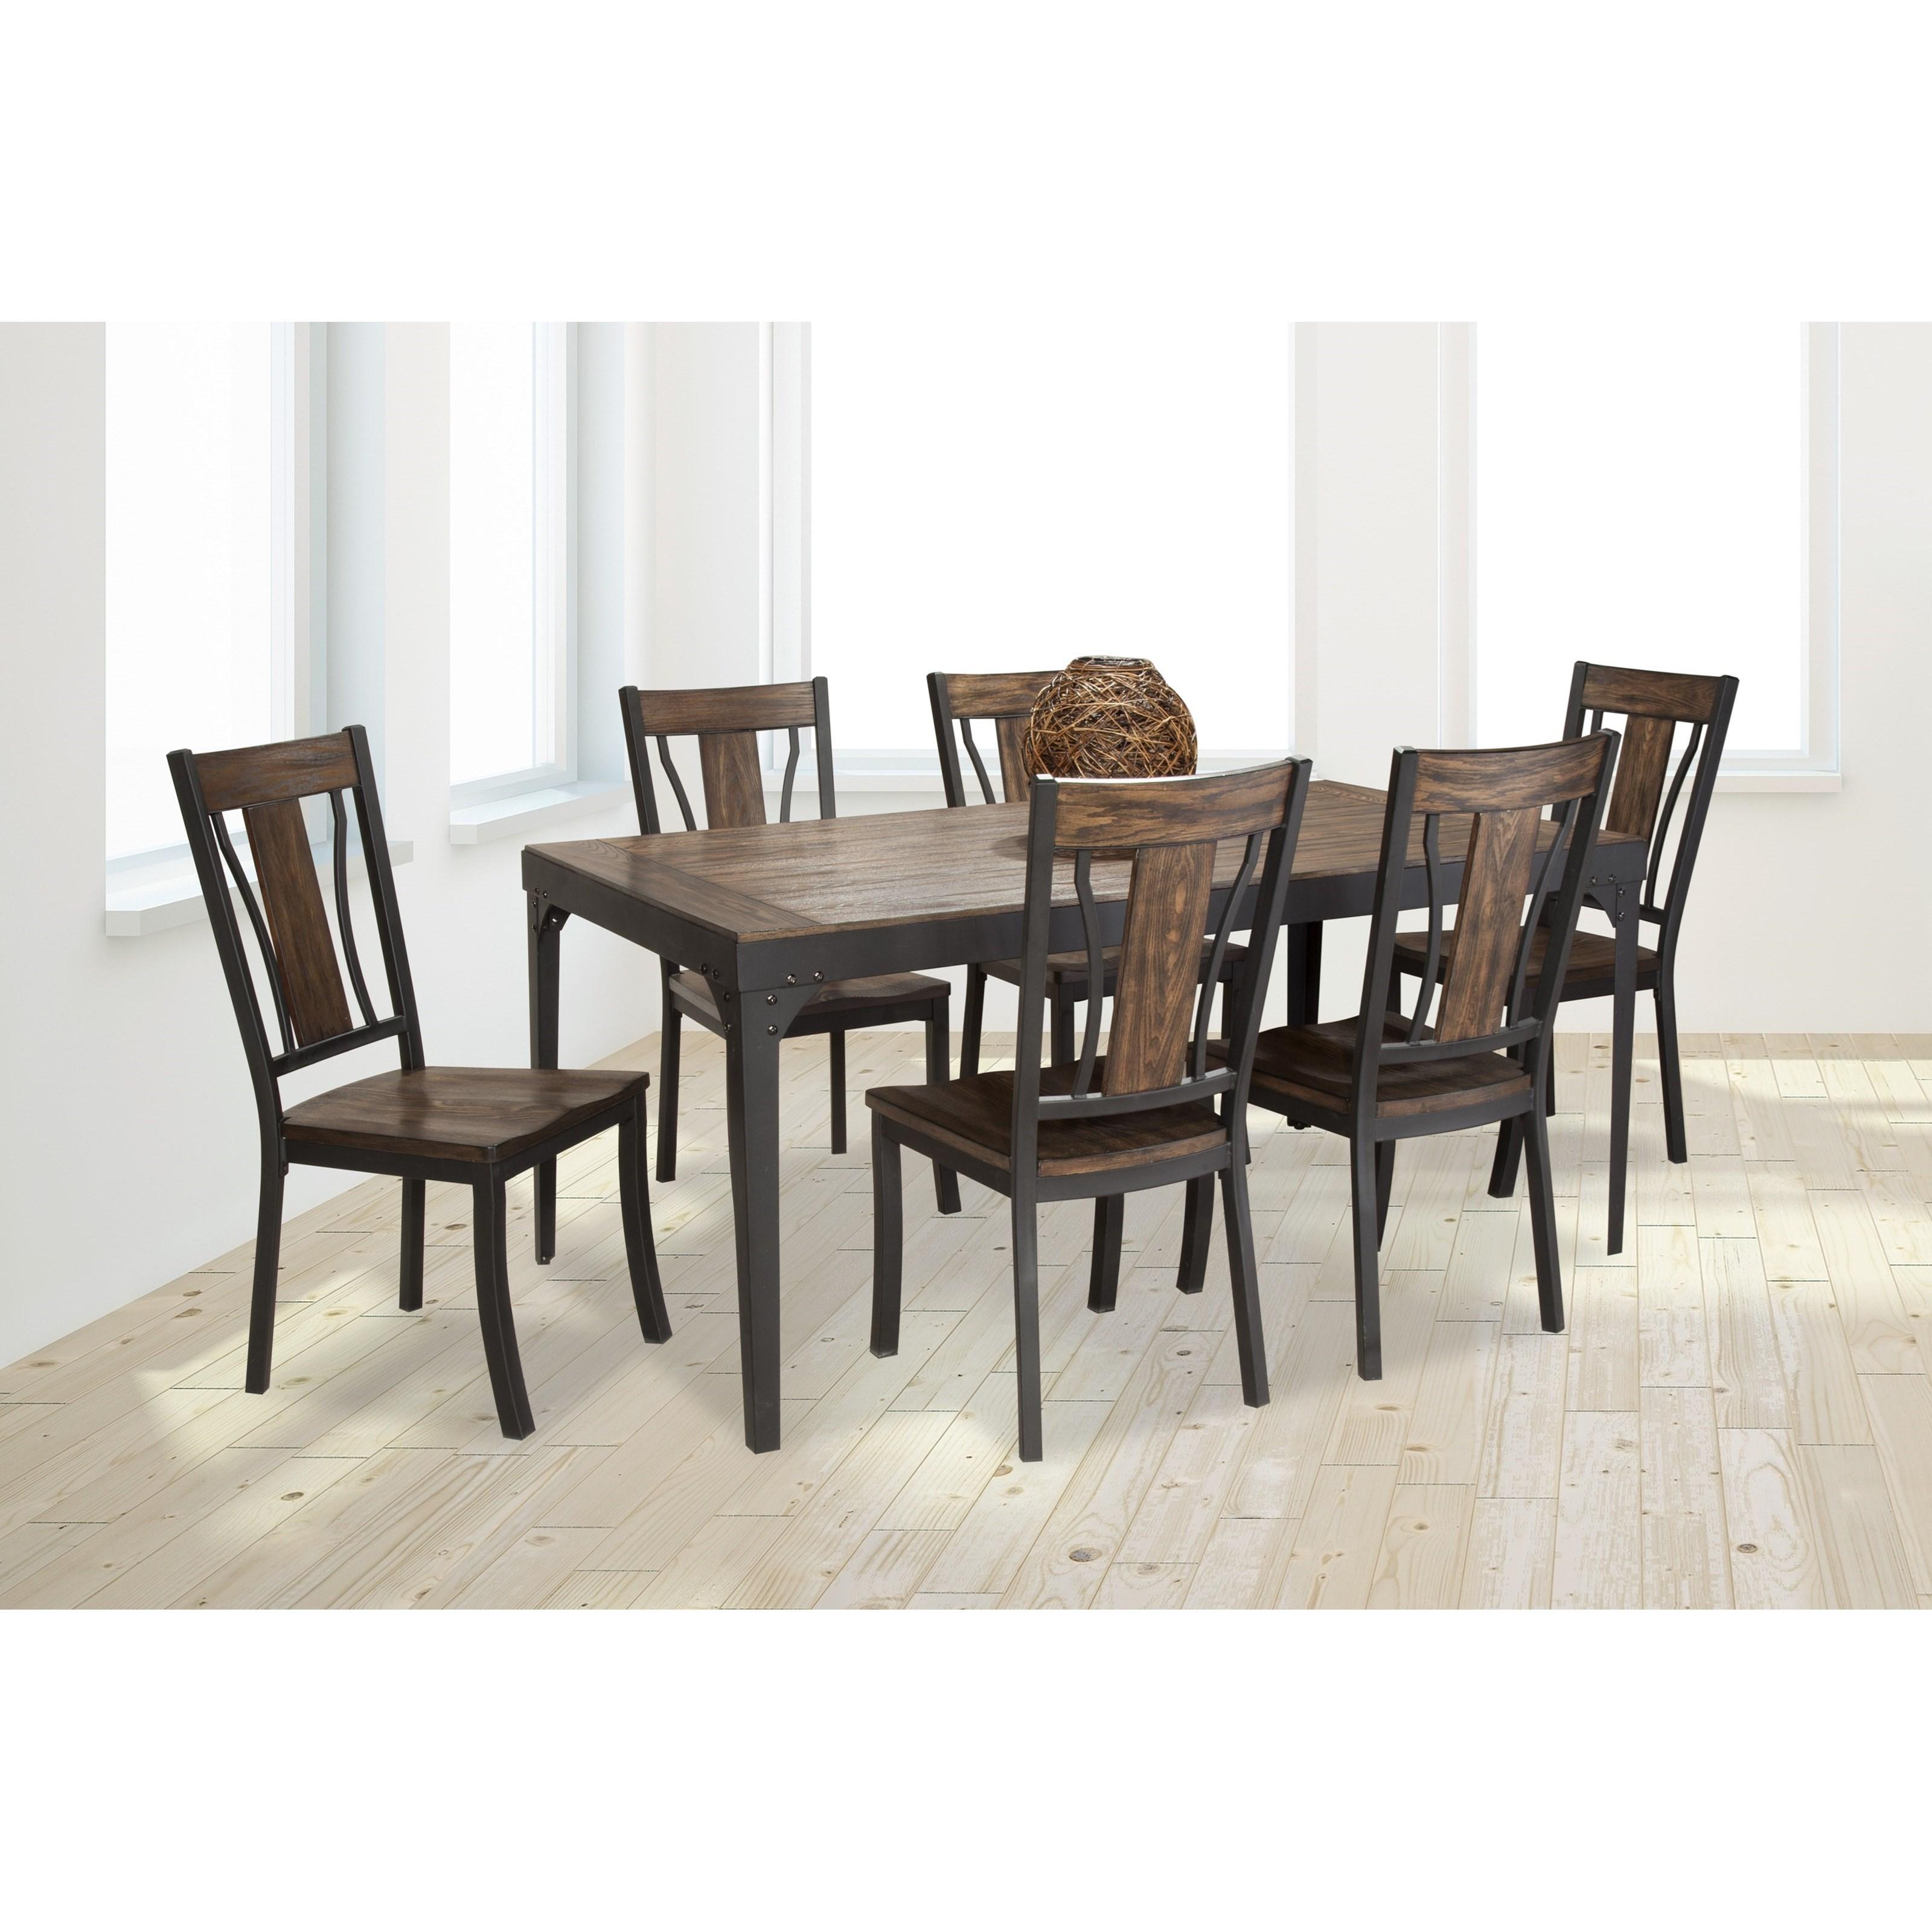 Metal And Wood Dining Table: Bernards Hollister Rectangular Metal And Wood Dining Table